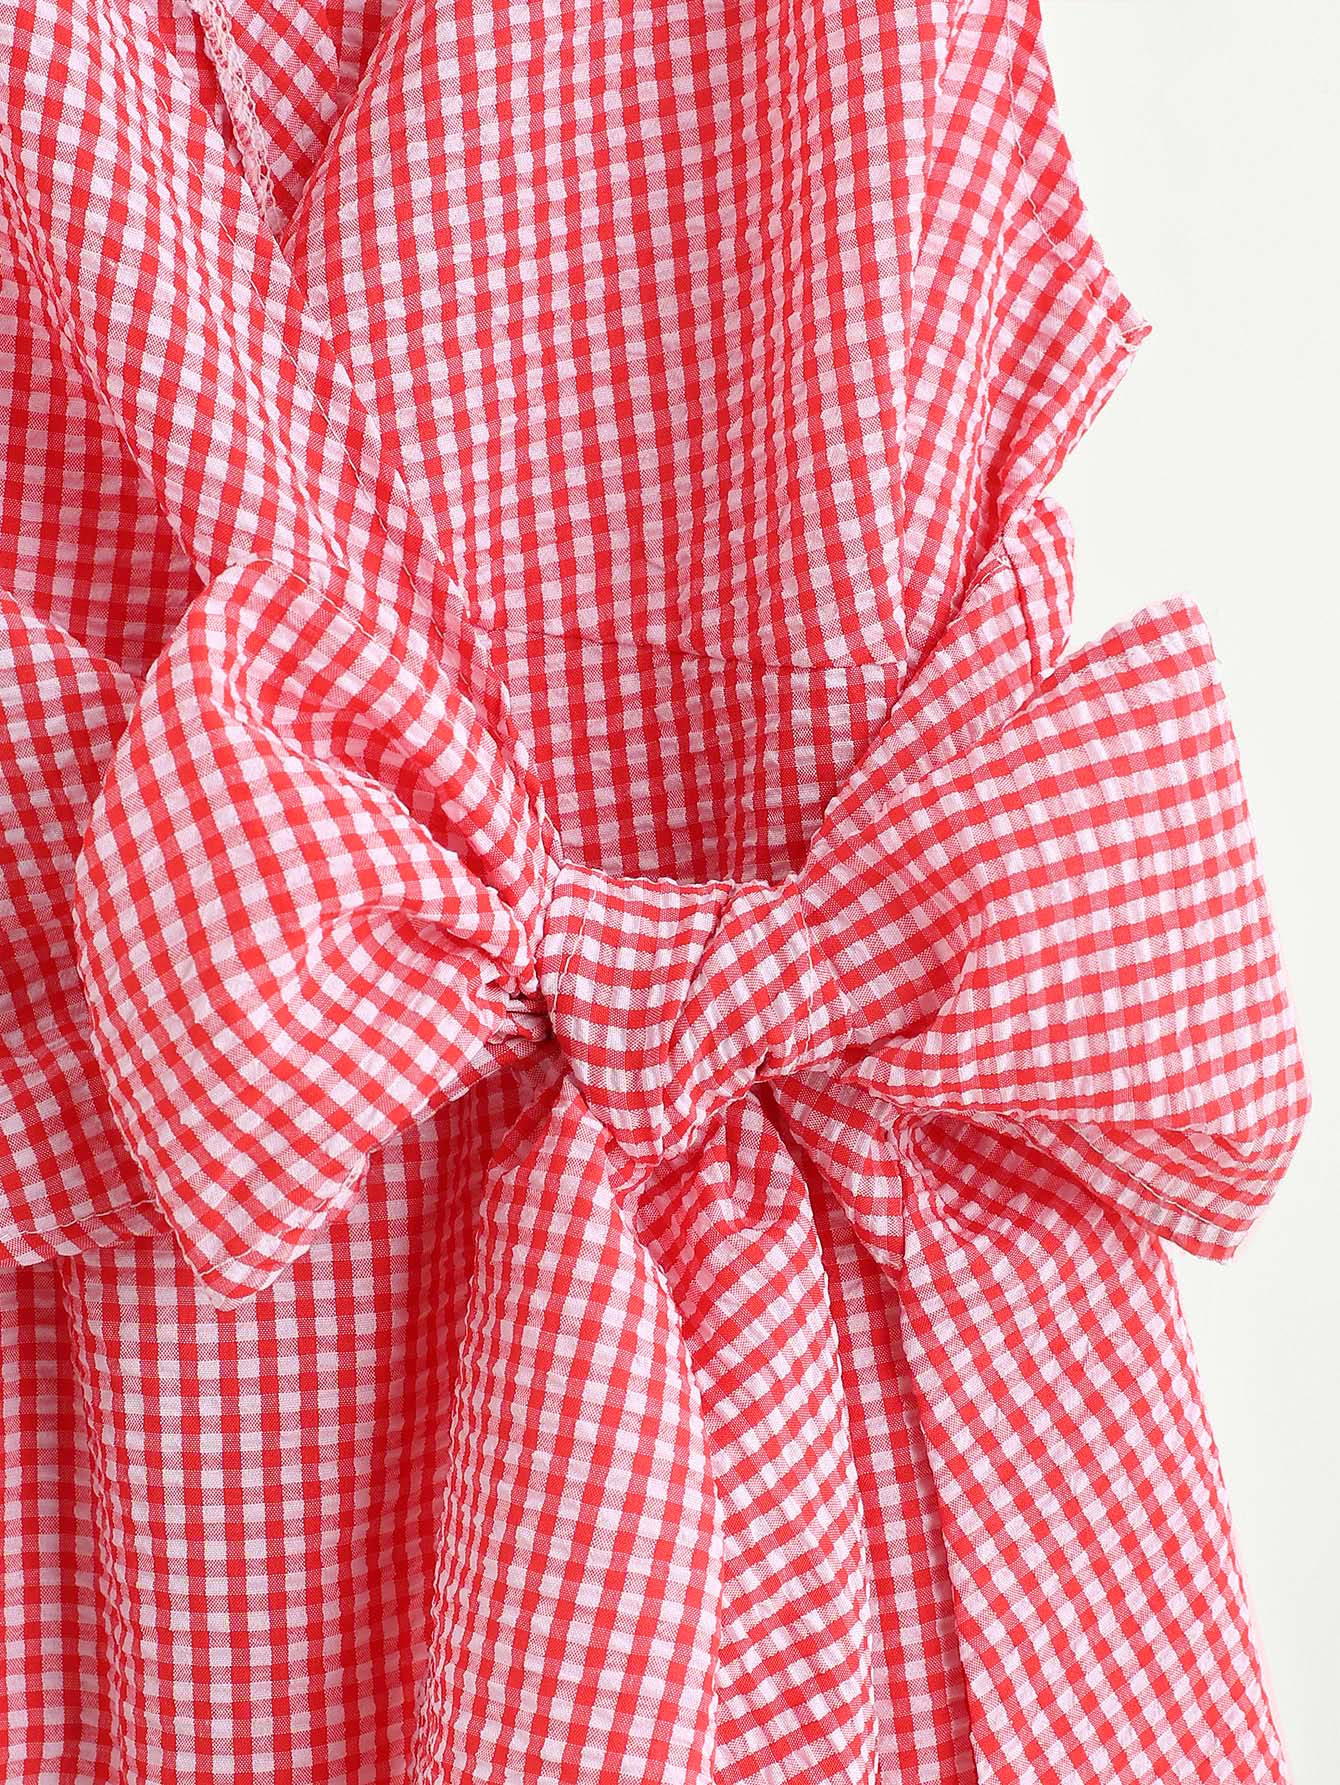 blouse170502101_2